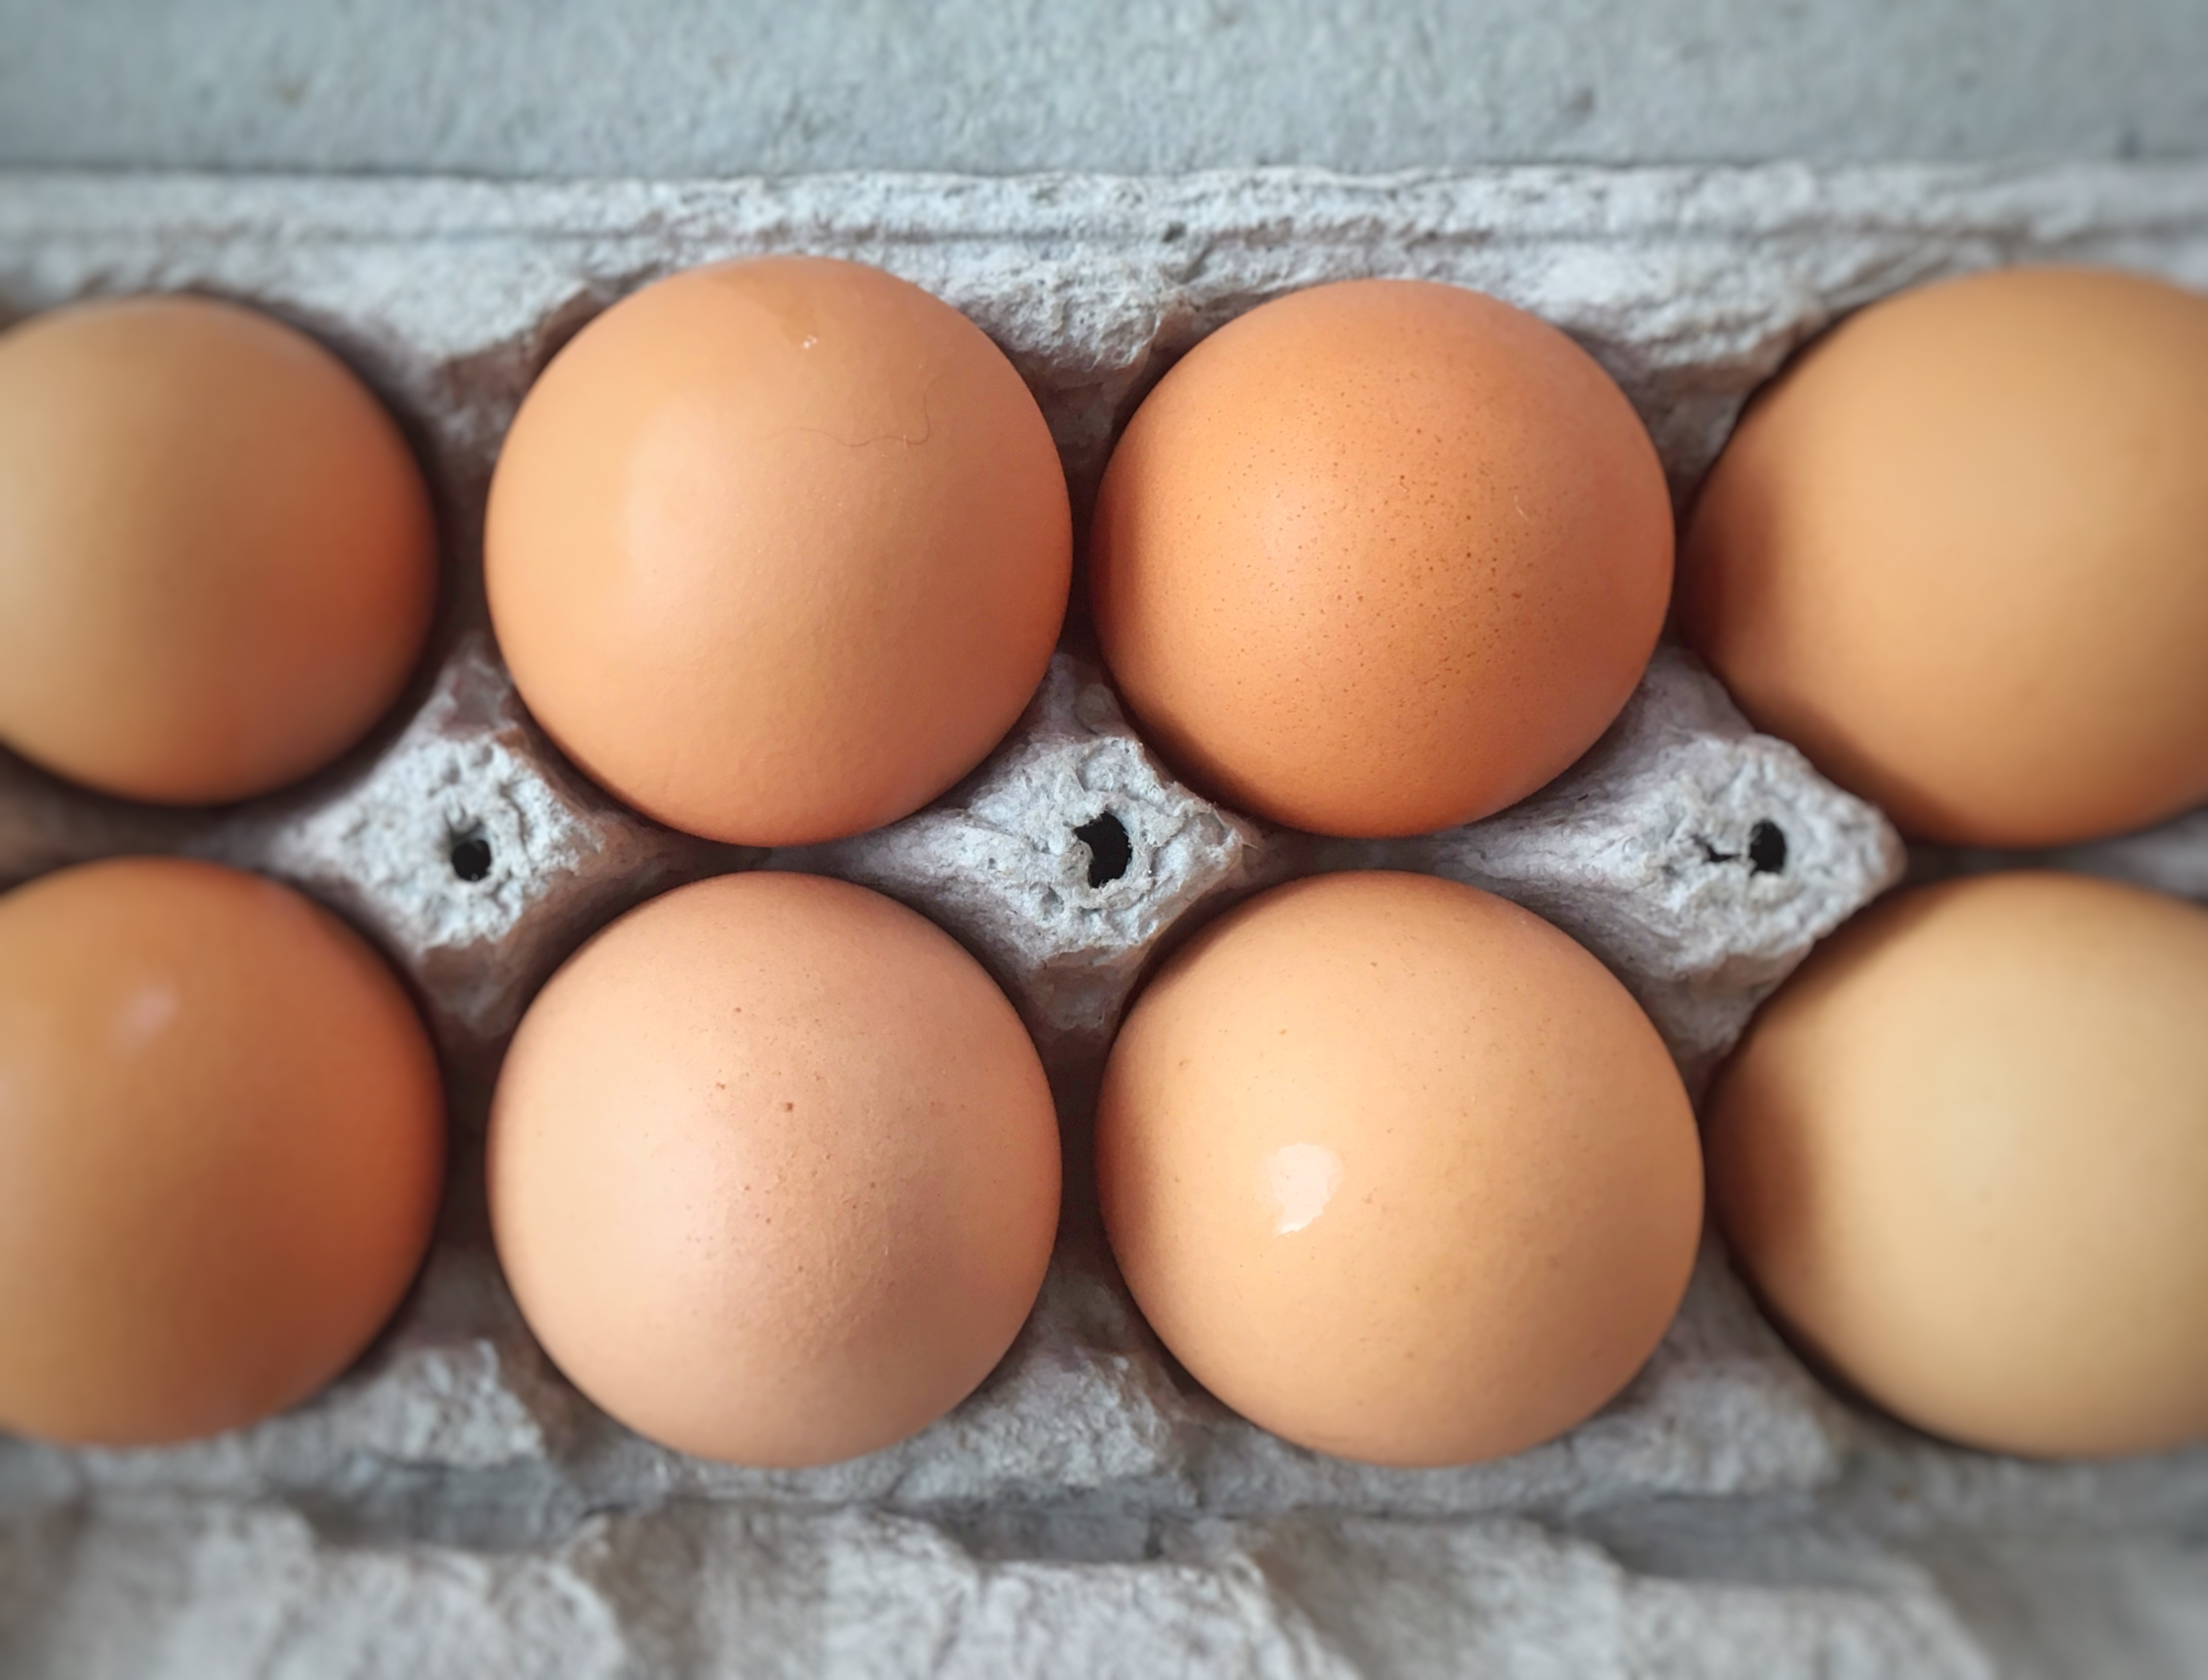 Eggs - Large